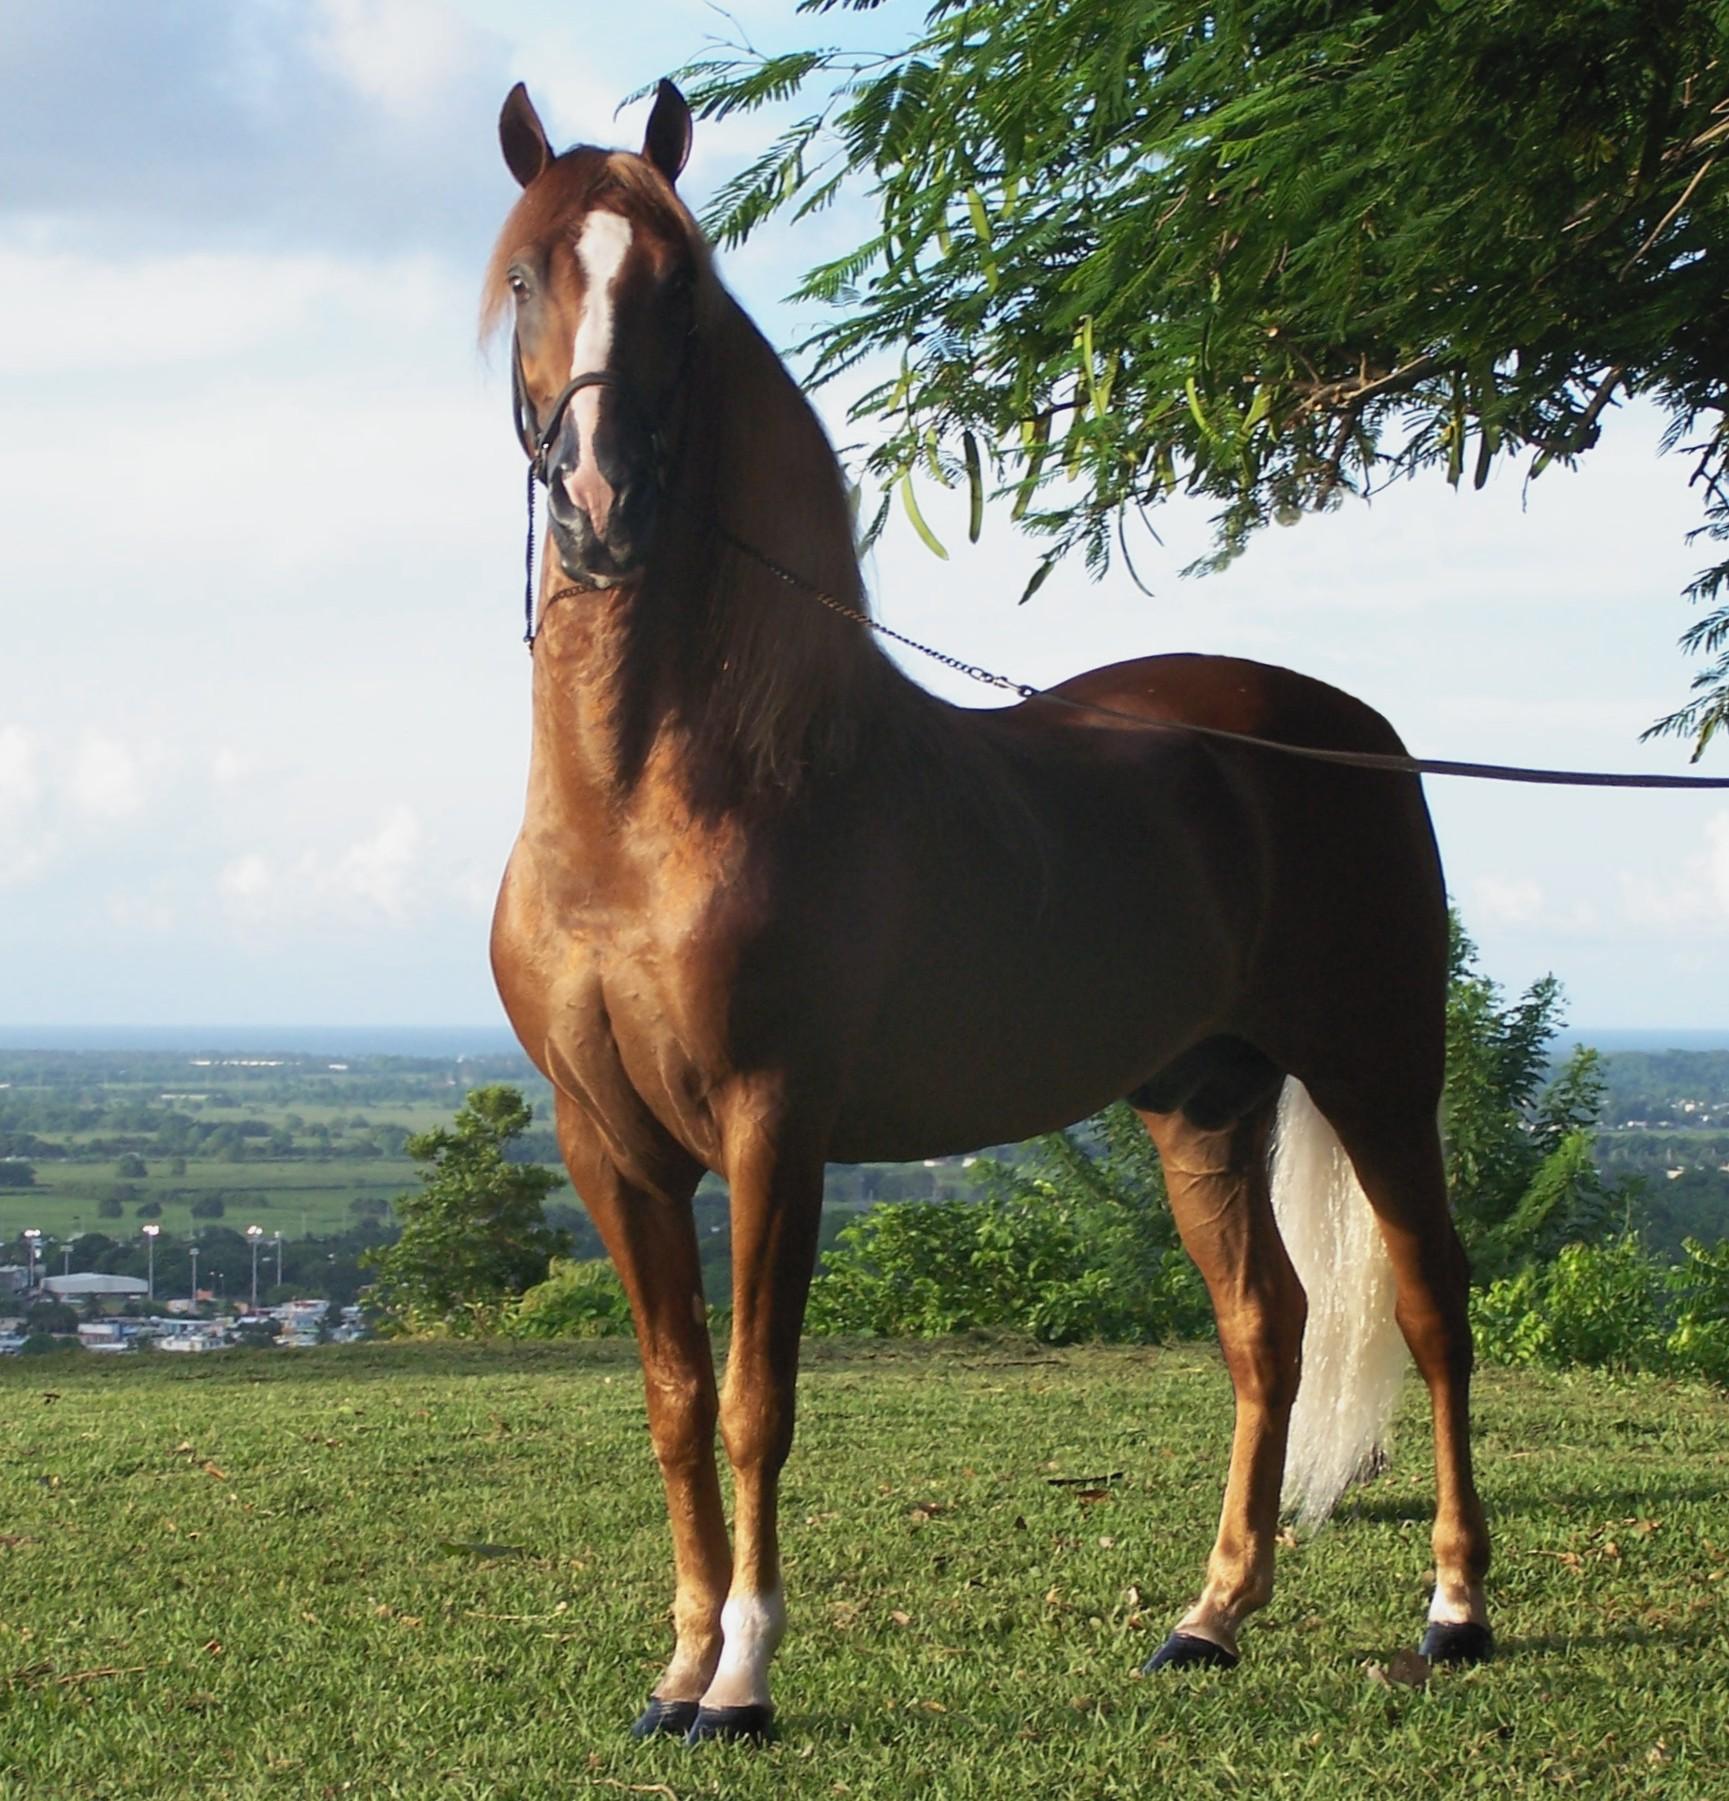 Puerto_rican-Paso-Fino-Horse-chestnut